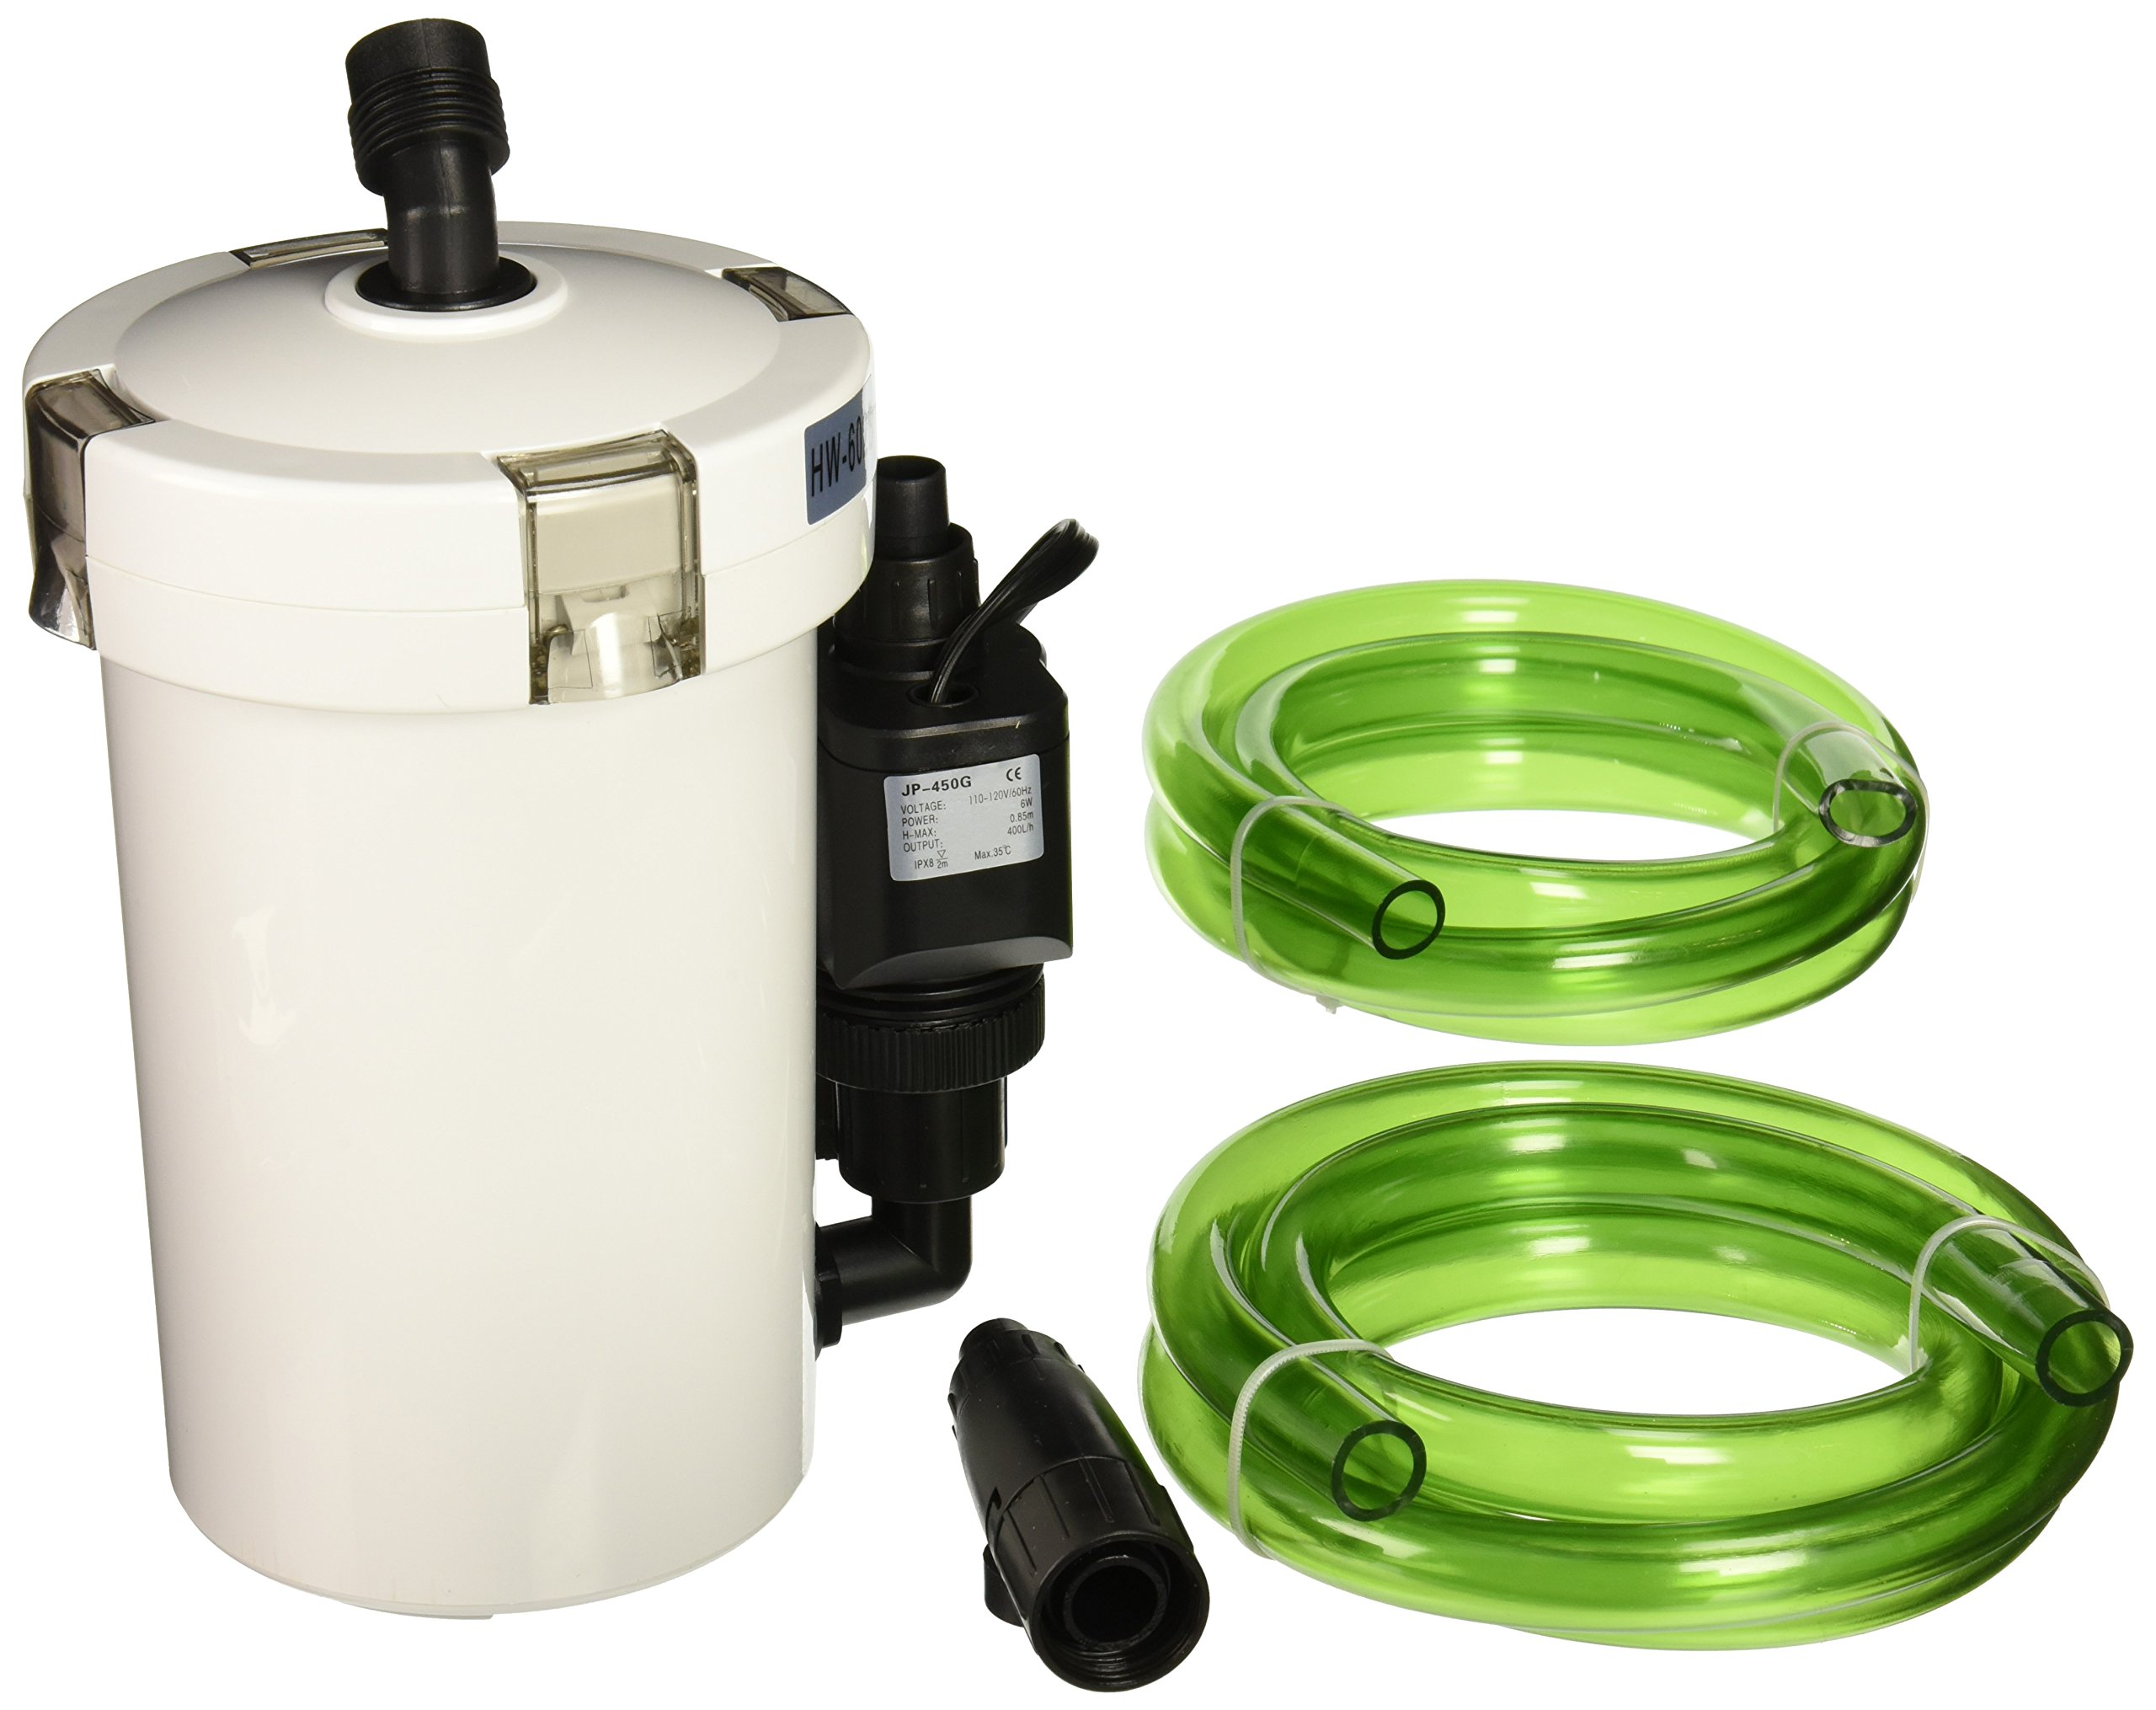 SunSun Tech'n'Toy HW-602B 106 GPH 3-Stage External Canister Filter